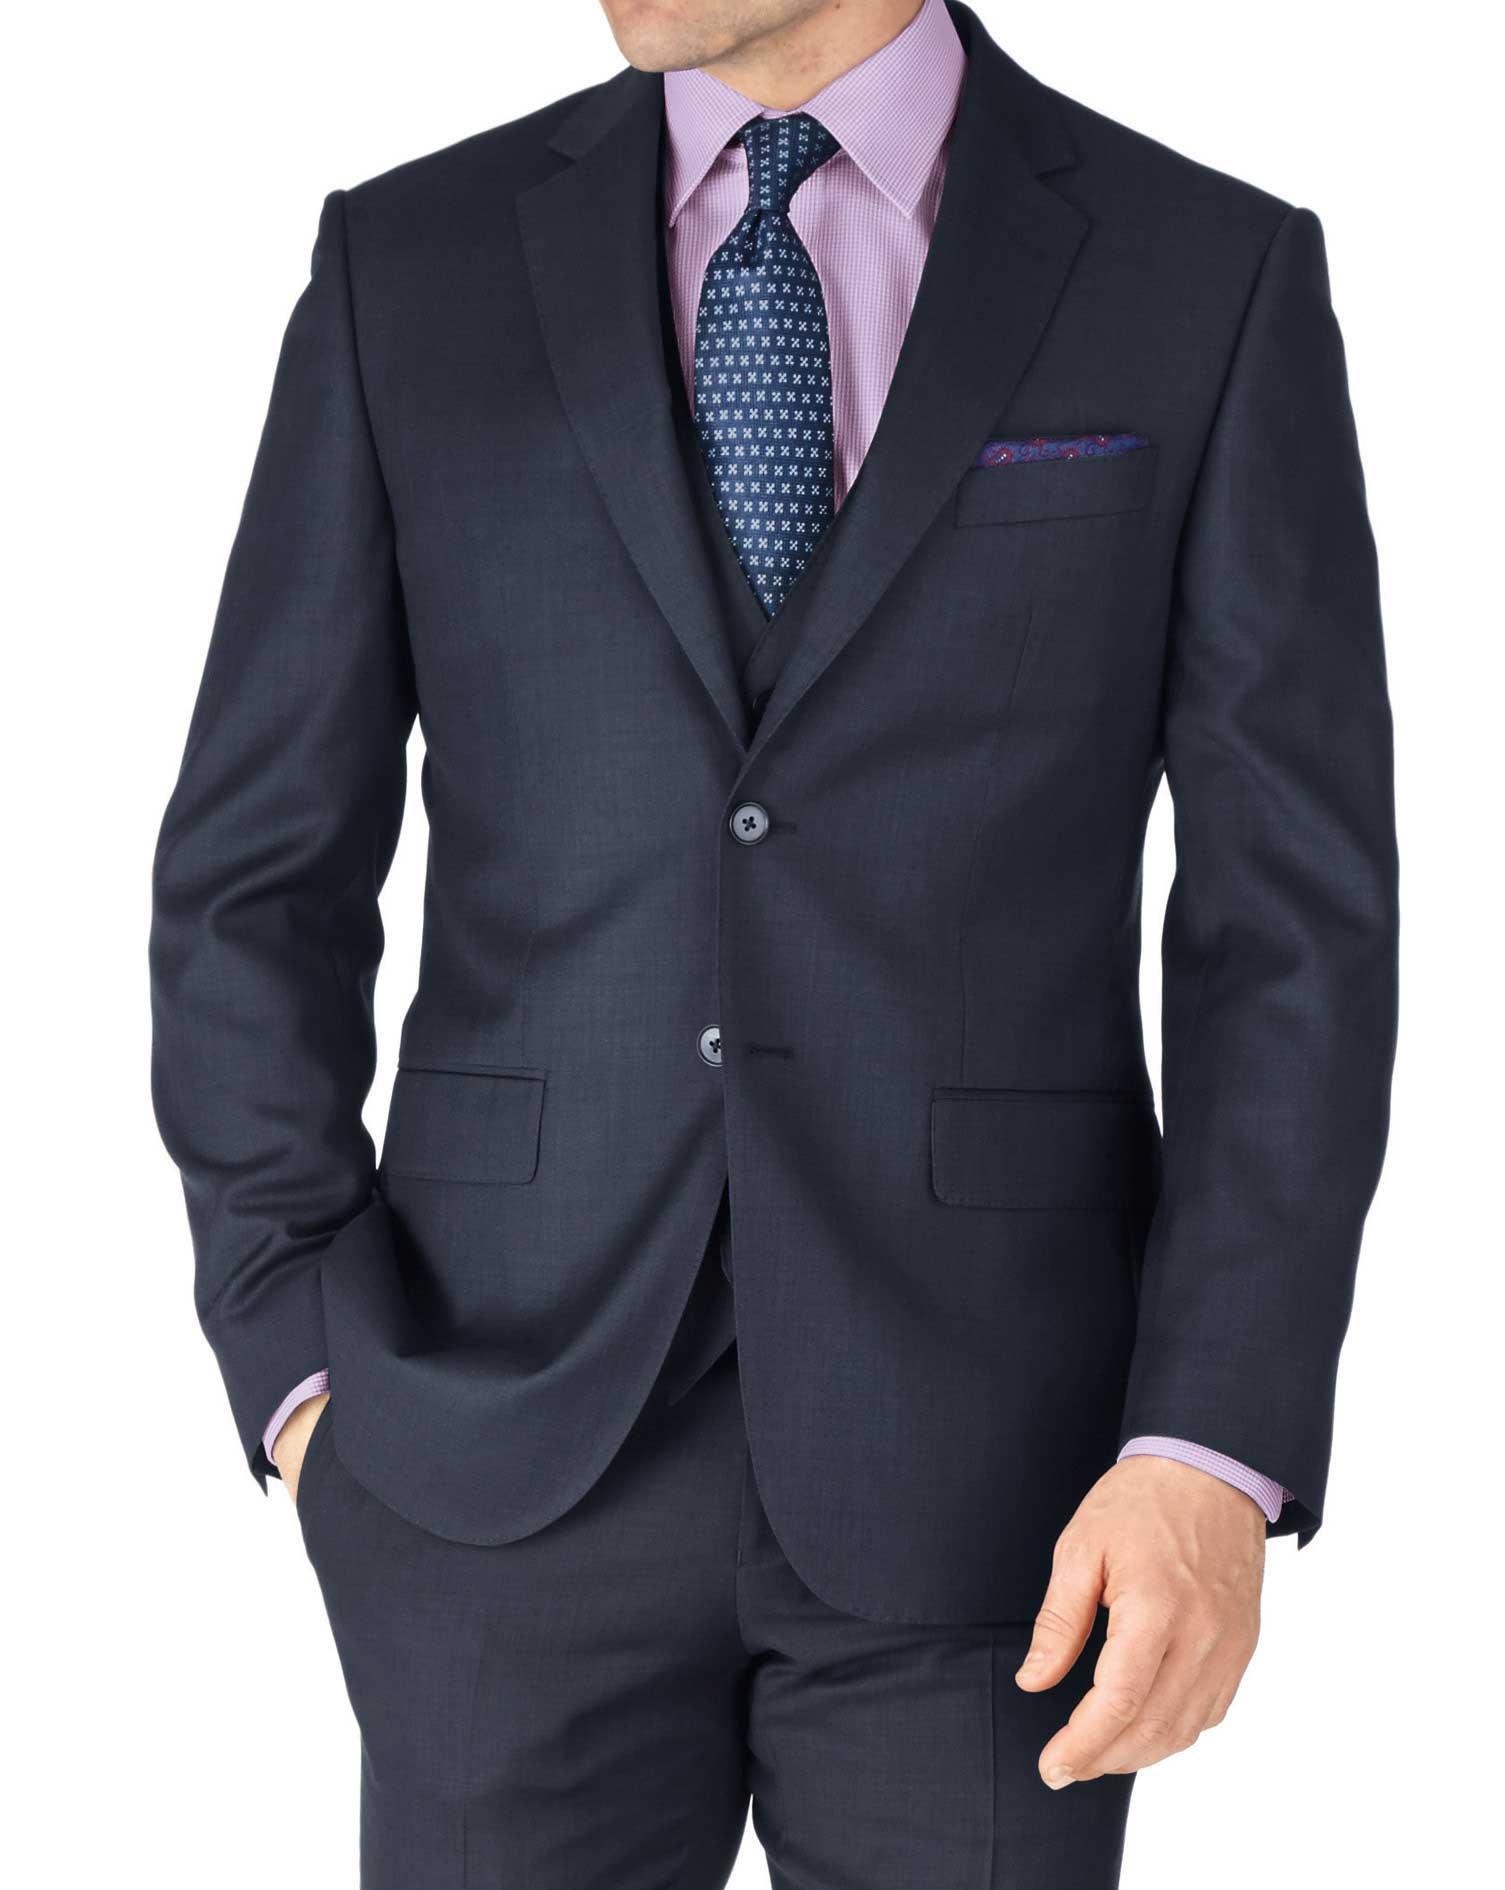 Blue Slim Fit Sharkskin Travel Suit Wool Jacket Size 40 Long by Charles Tyrwhitt